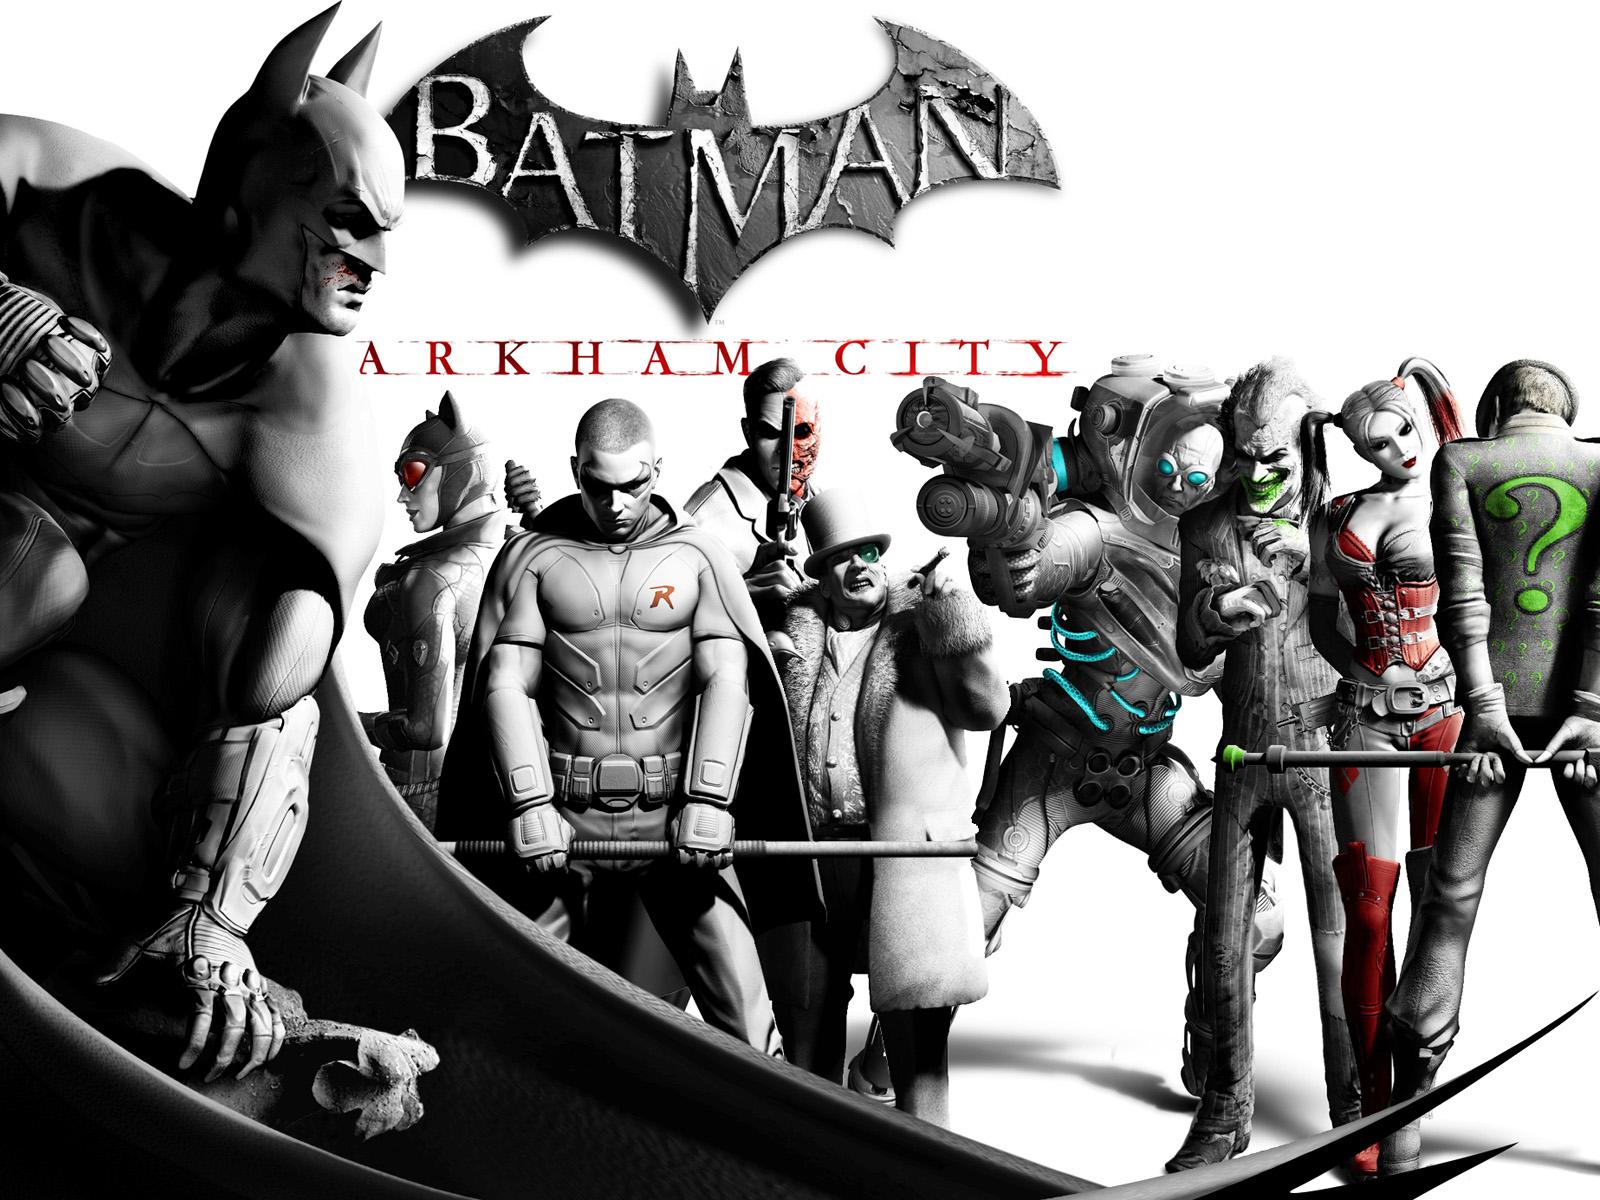 Batman Arkham City Chipset